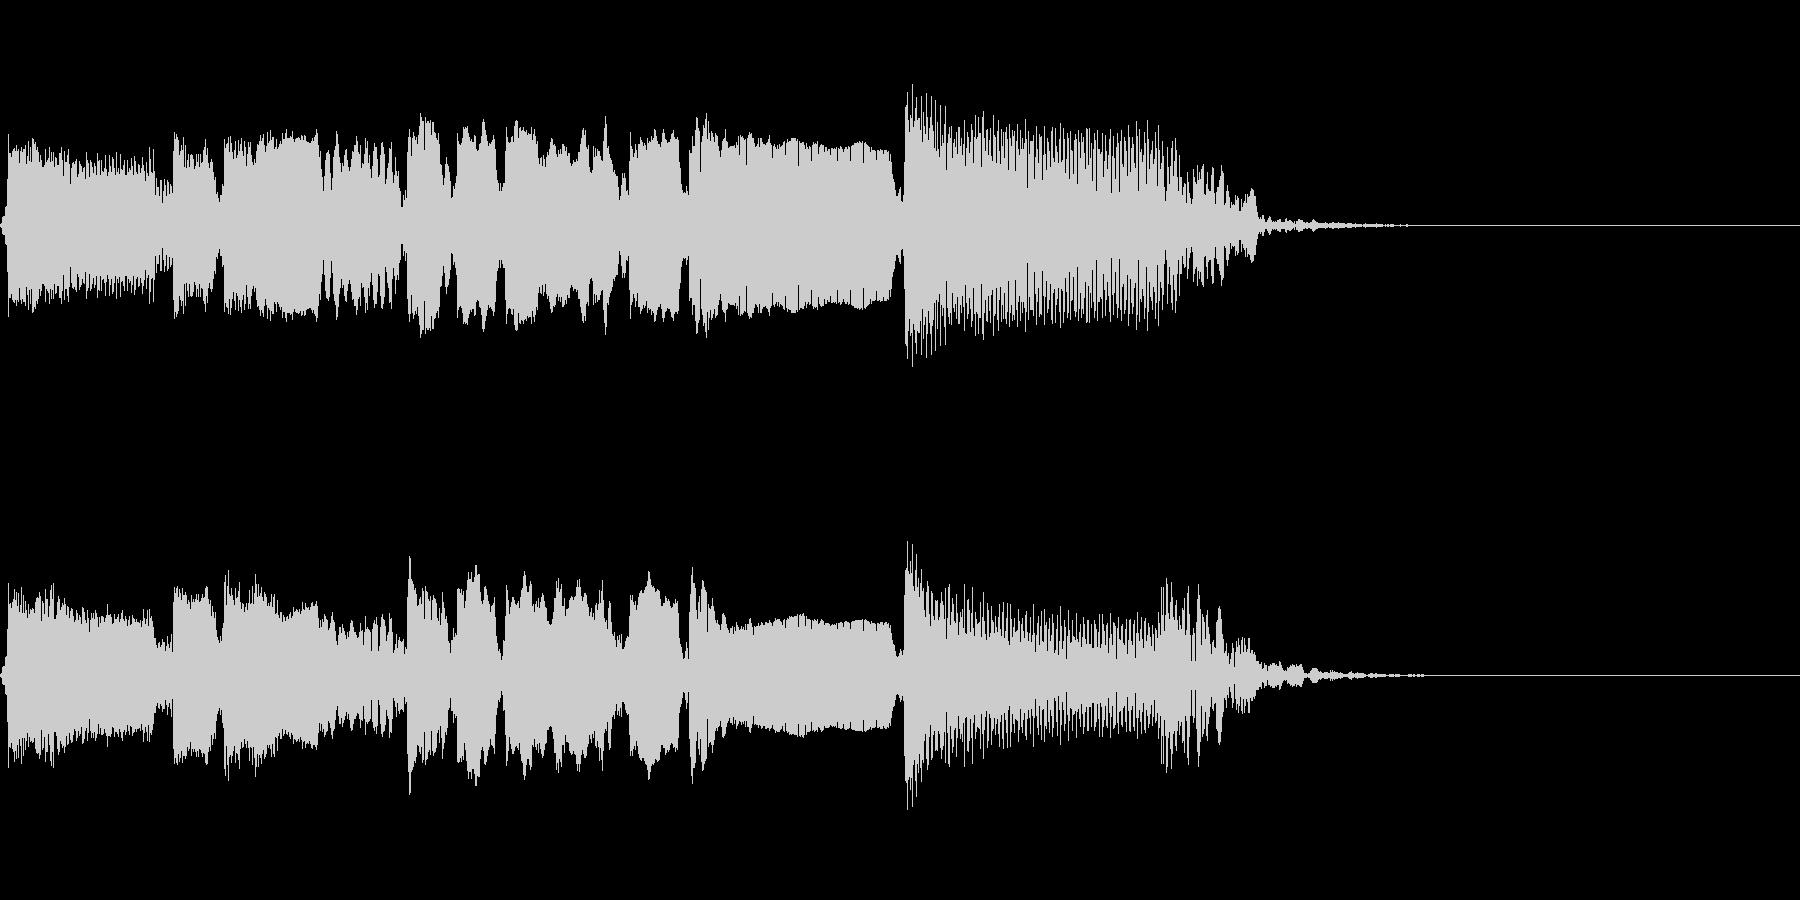 Guitarジングル6/ブルージーの未再生の波形